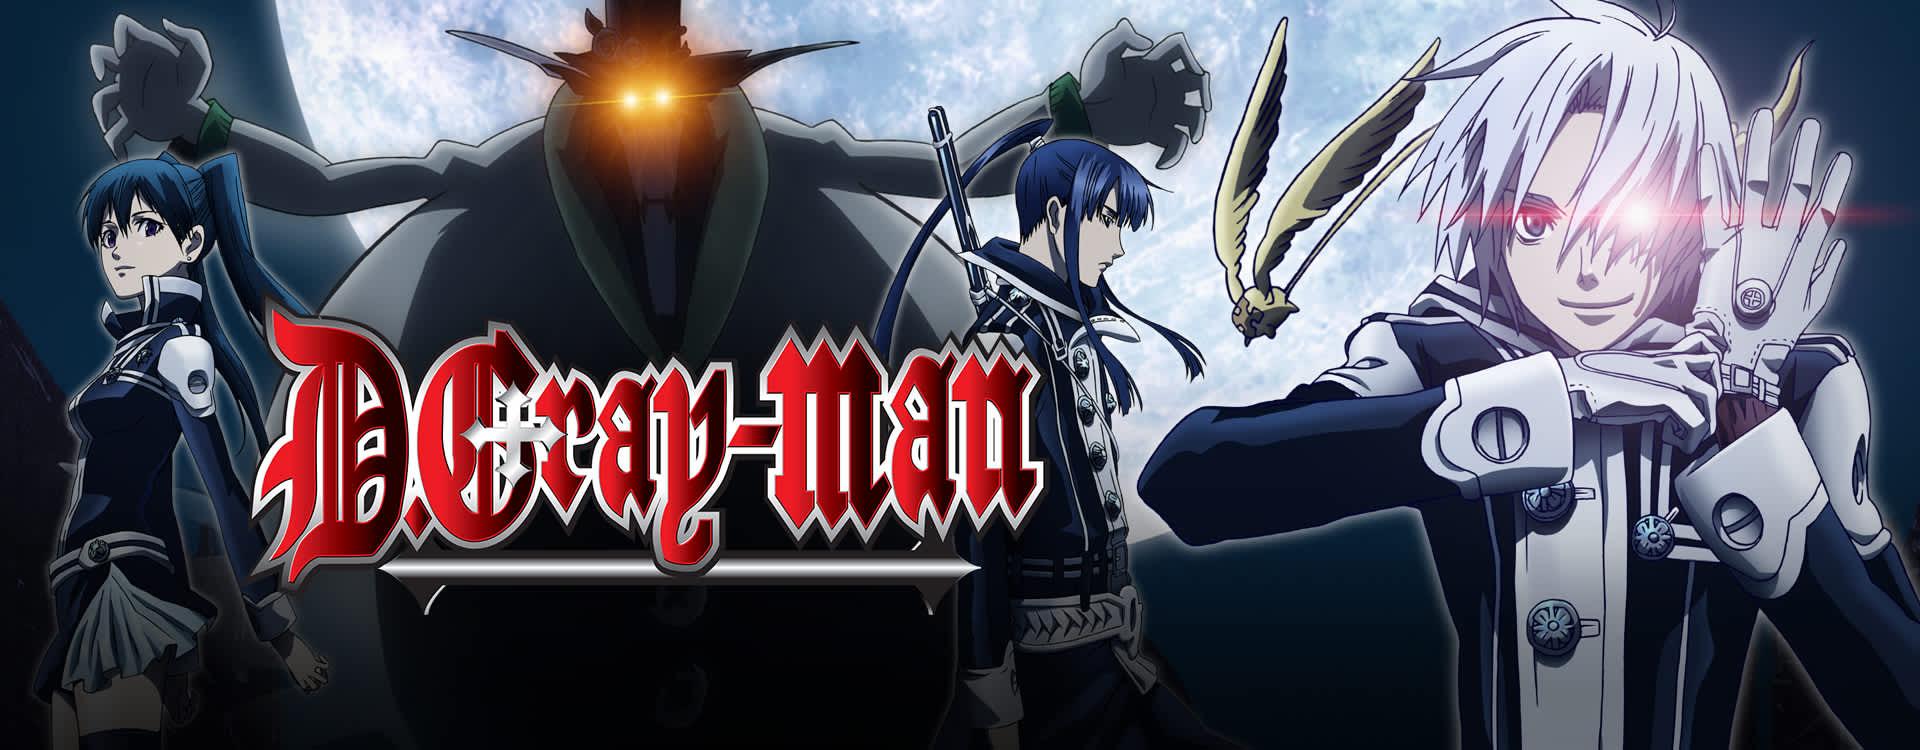 d gray man video game